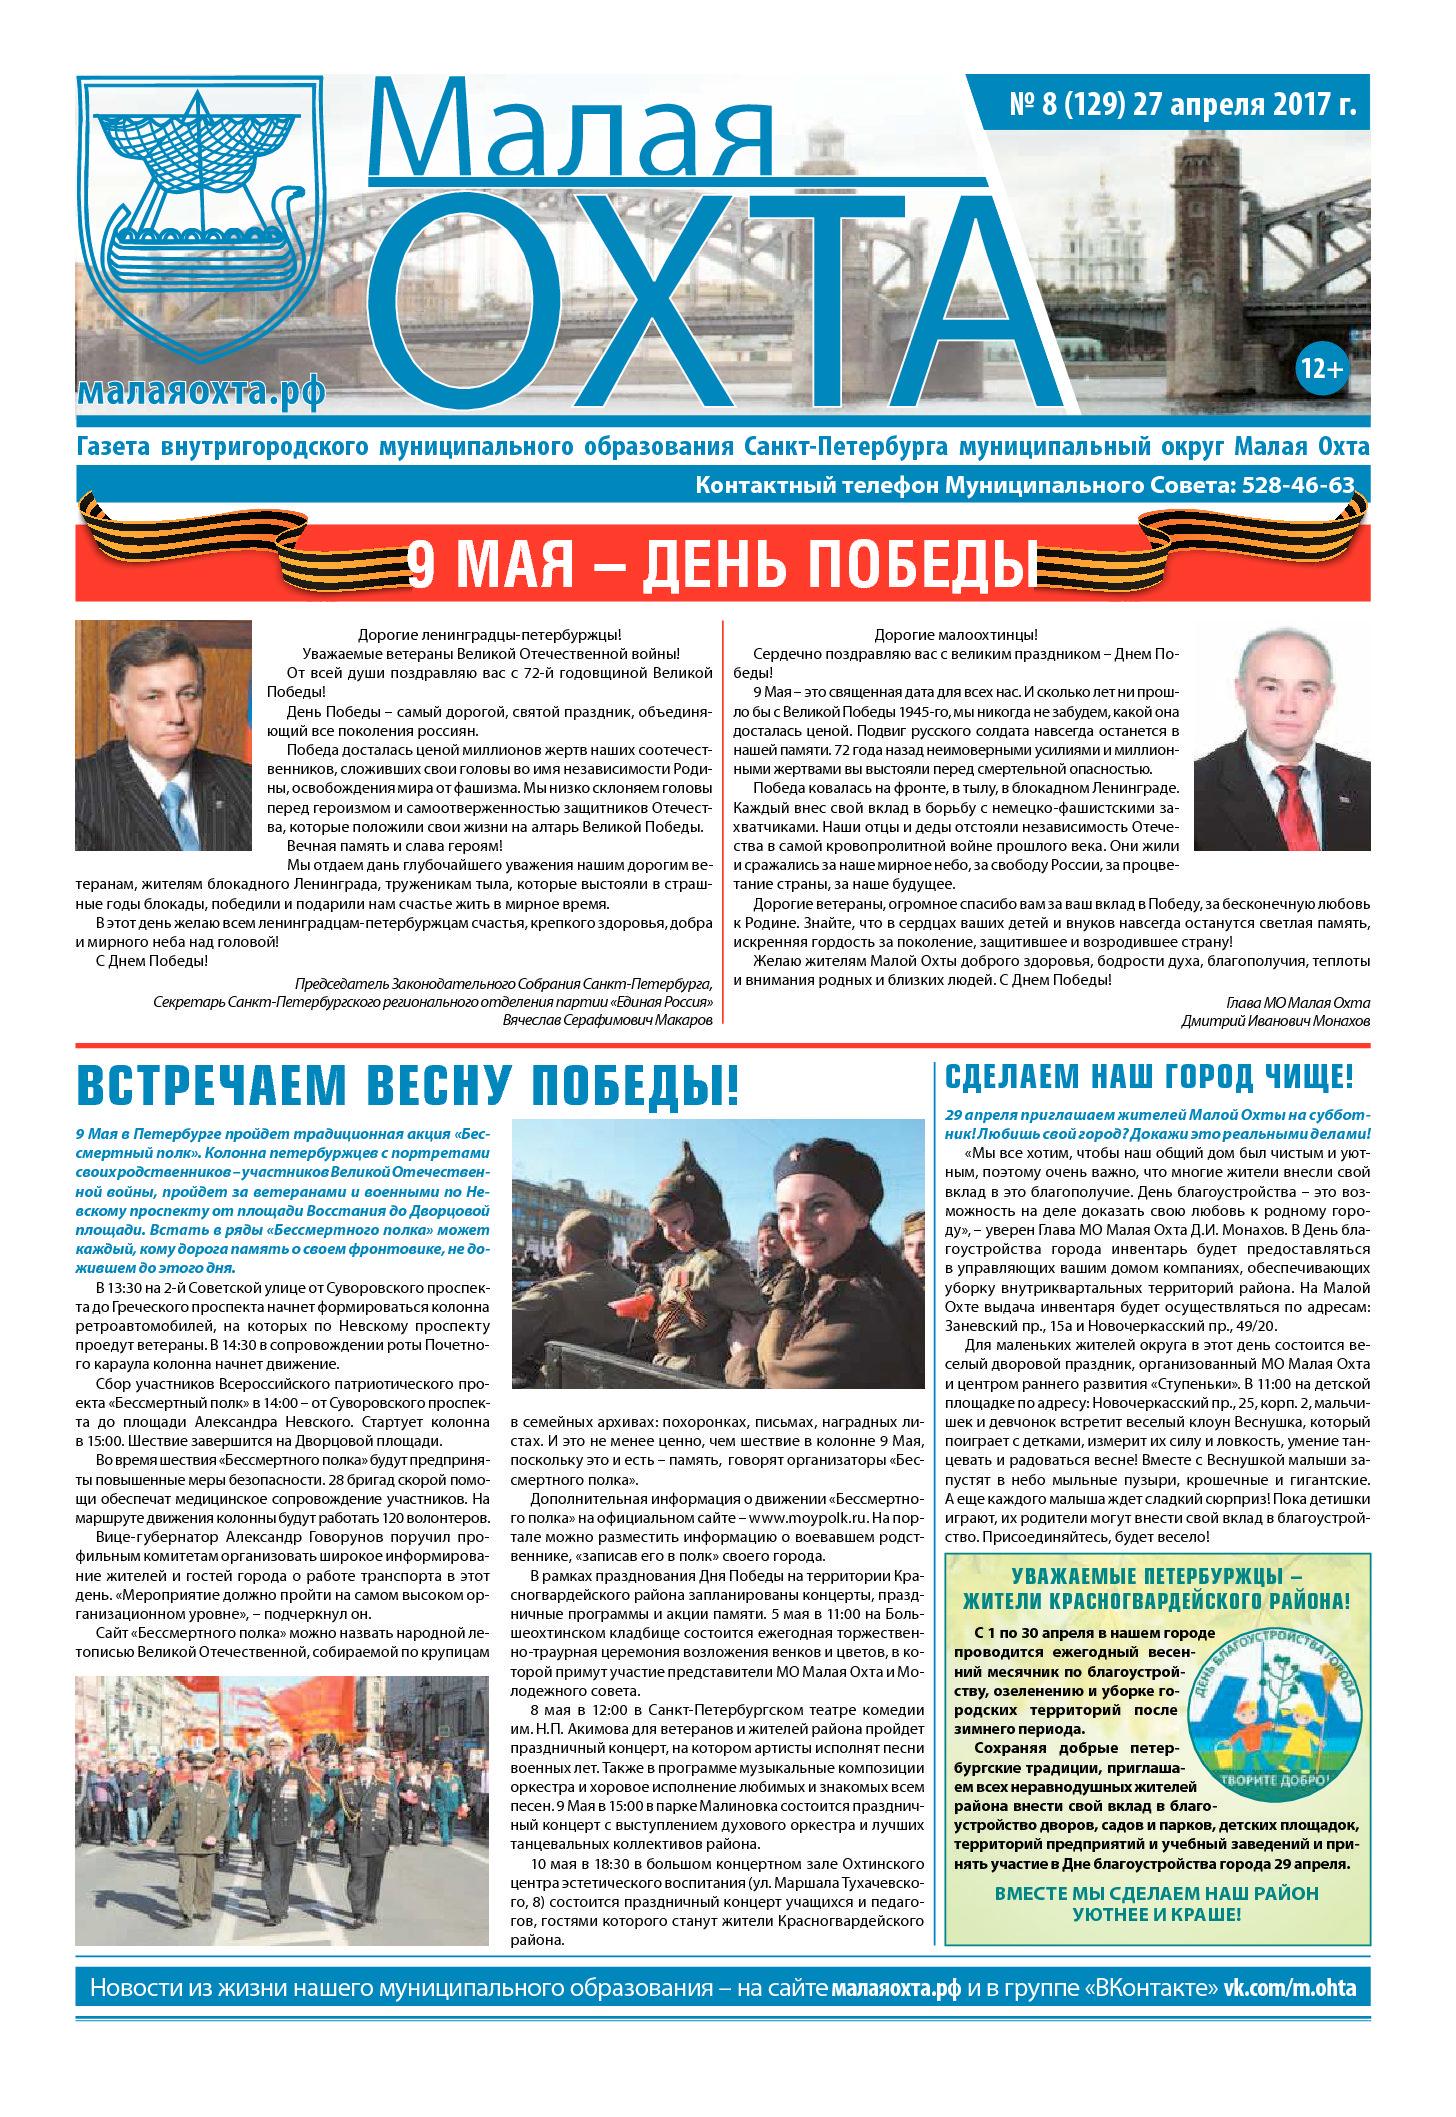 Газета № 08 2017